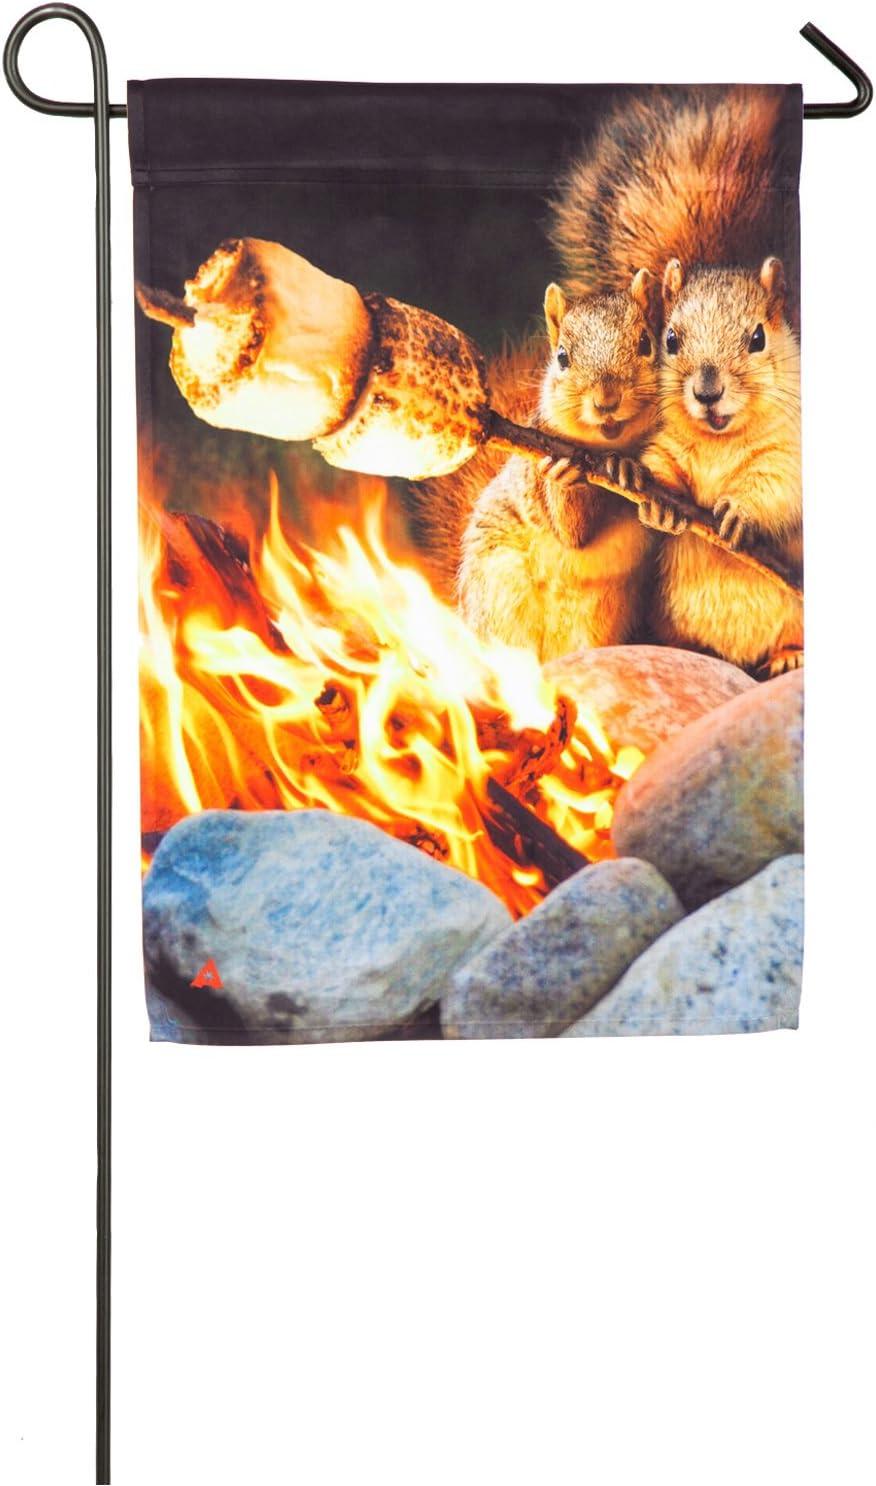 NEW EVERGREEN 2-SIDED CHEERFUL GARDEN FLAG LOVIN/' LIFE WHIMSICAL SNAIL 12.5 x 18